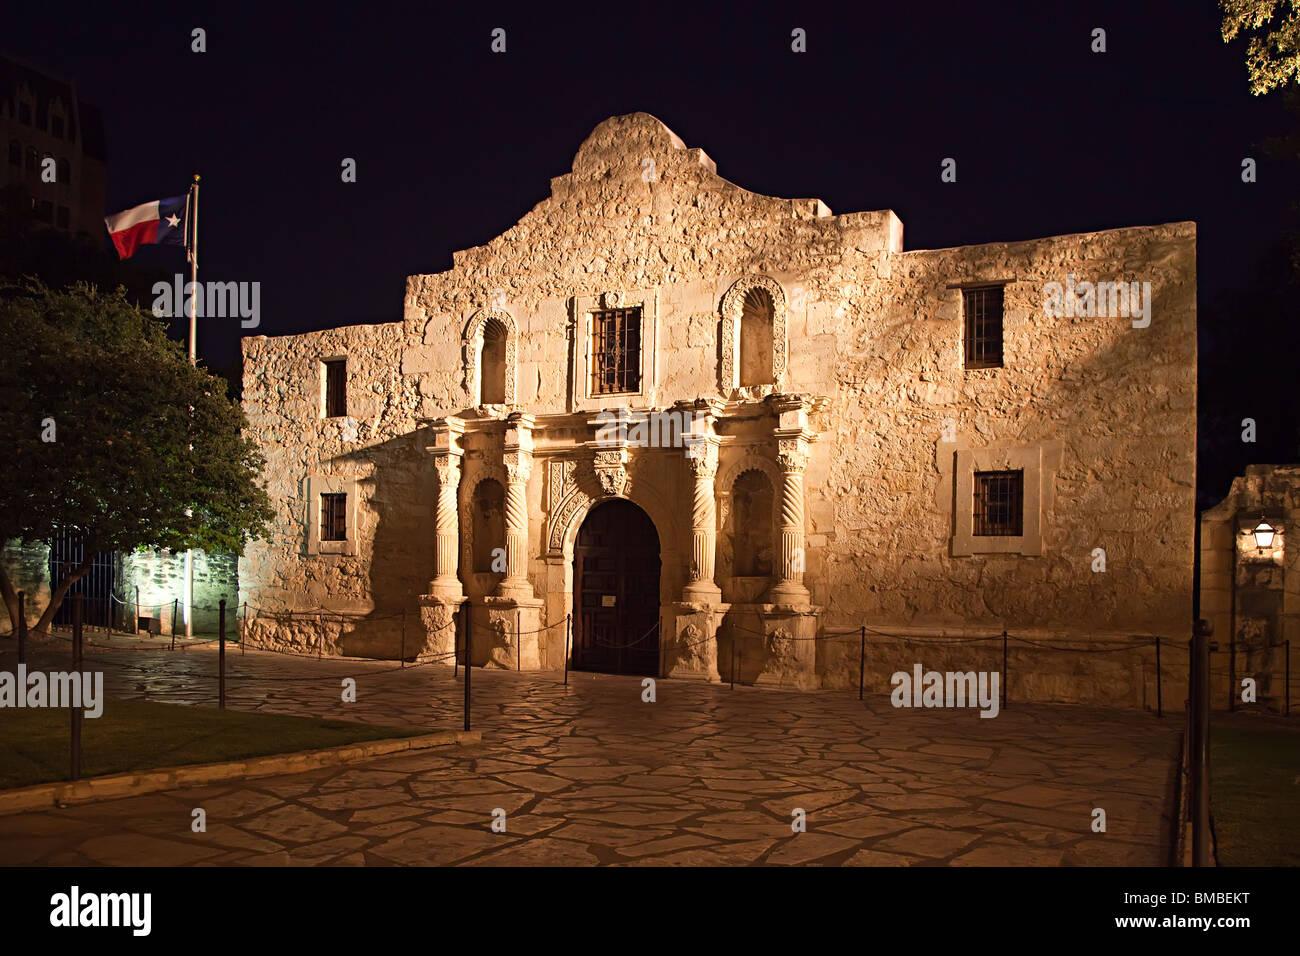 The Alamo floodlit at night San Antonio Texas USA - Stock Image